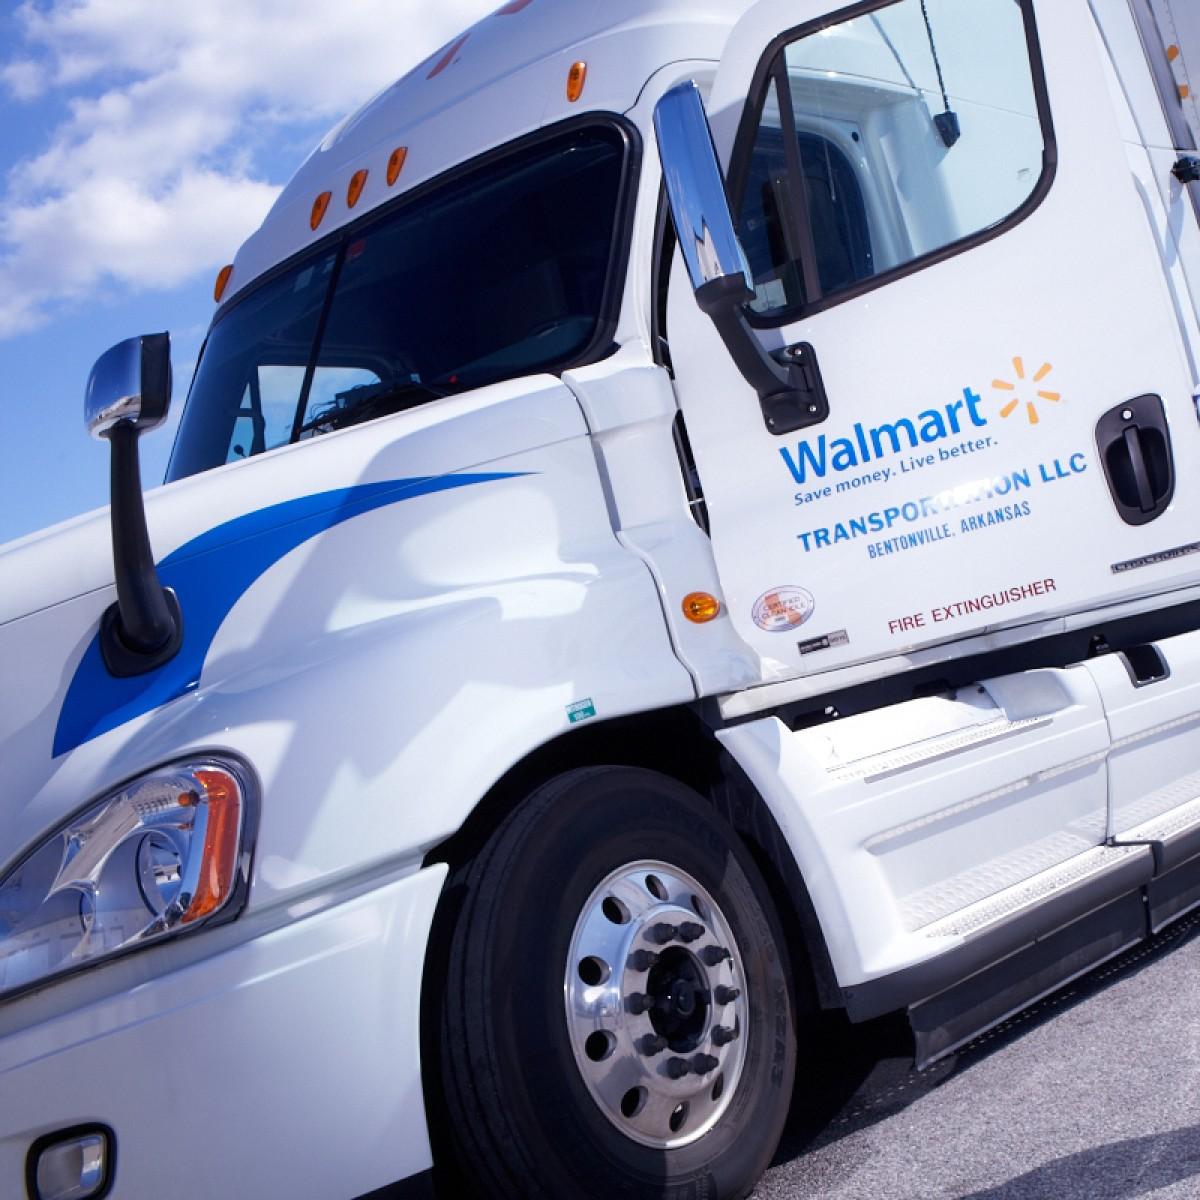 Walmart's Truck Fleet